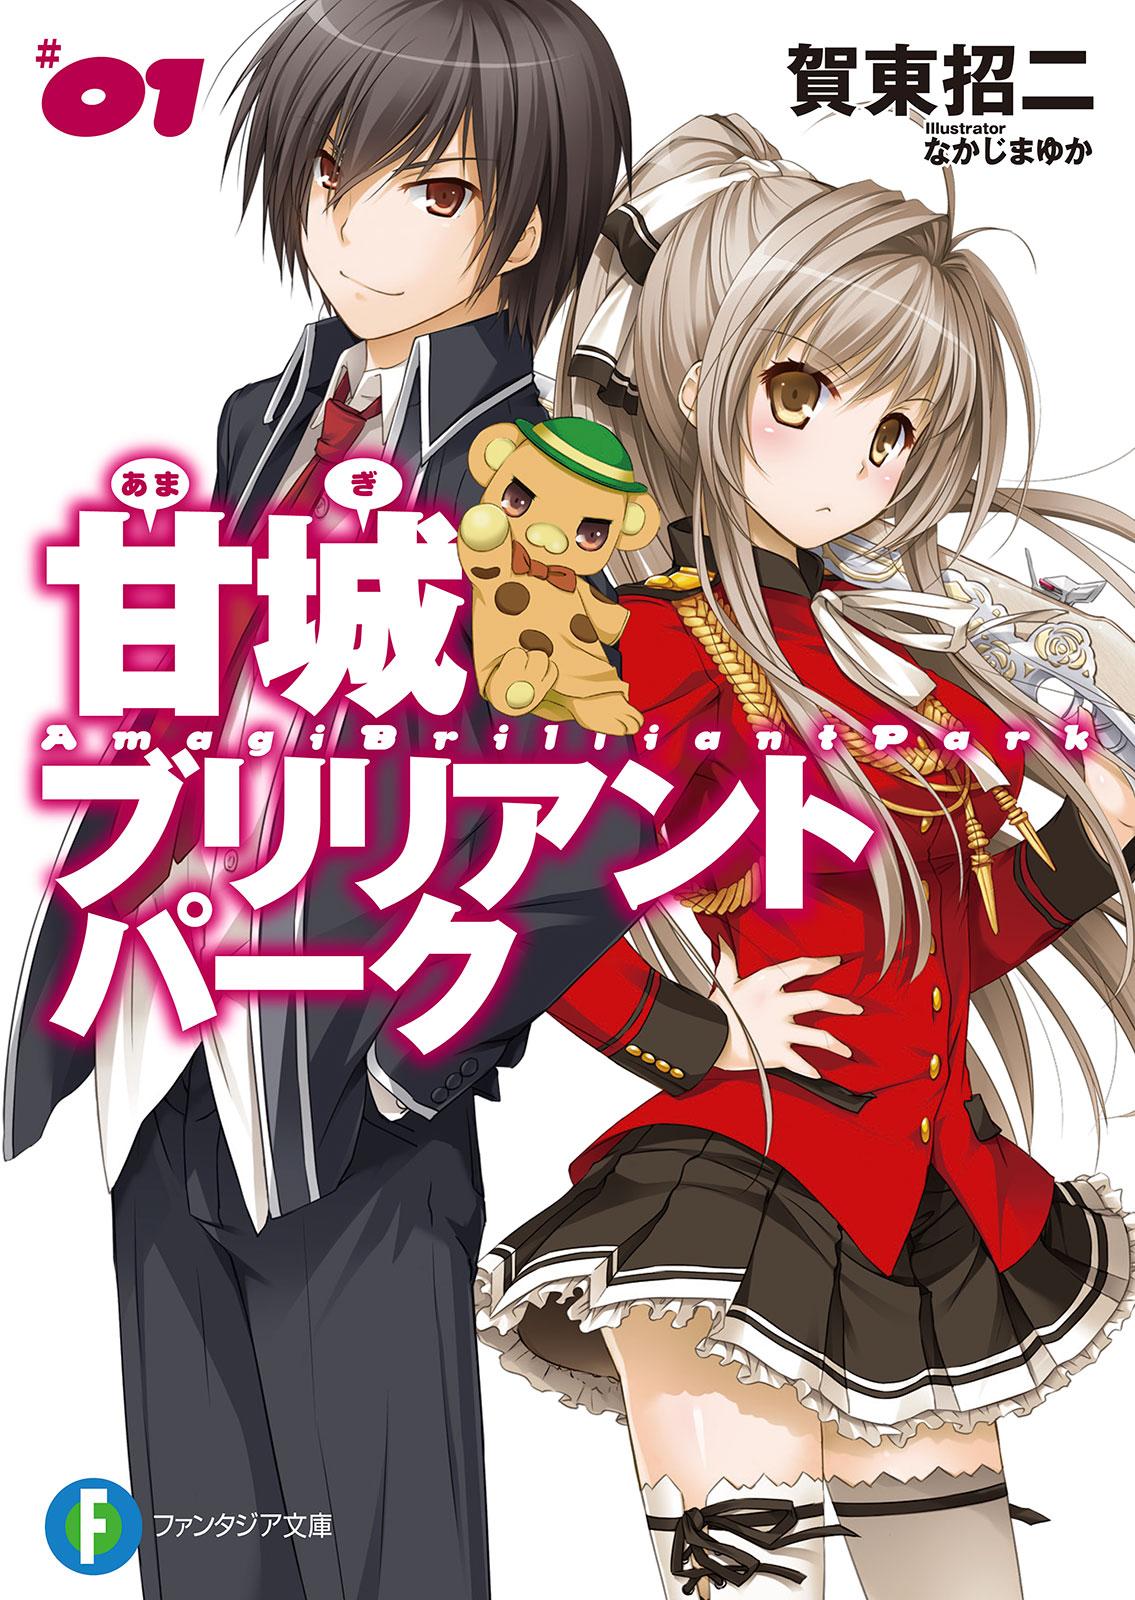 Serien Stream Chuunibyou